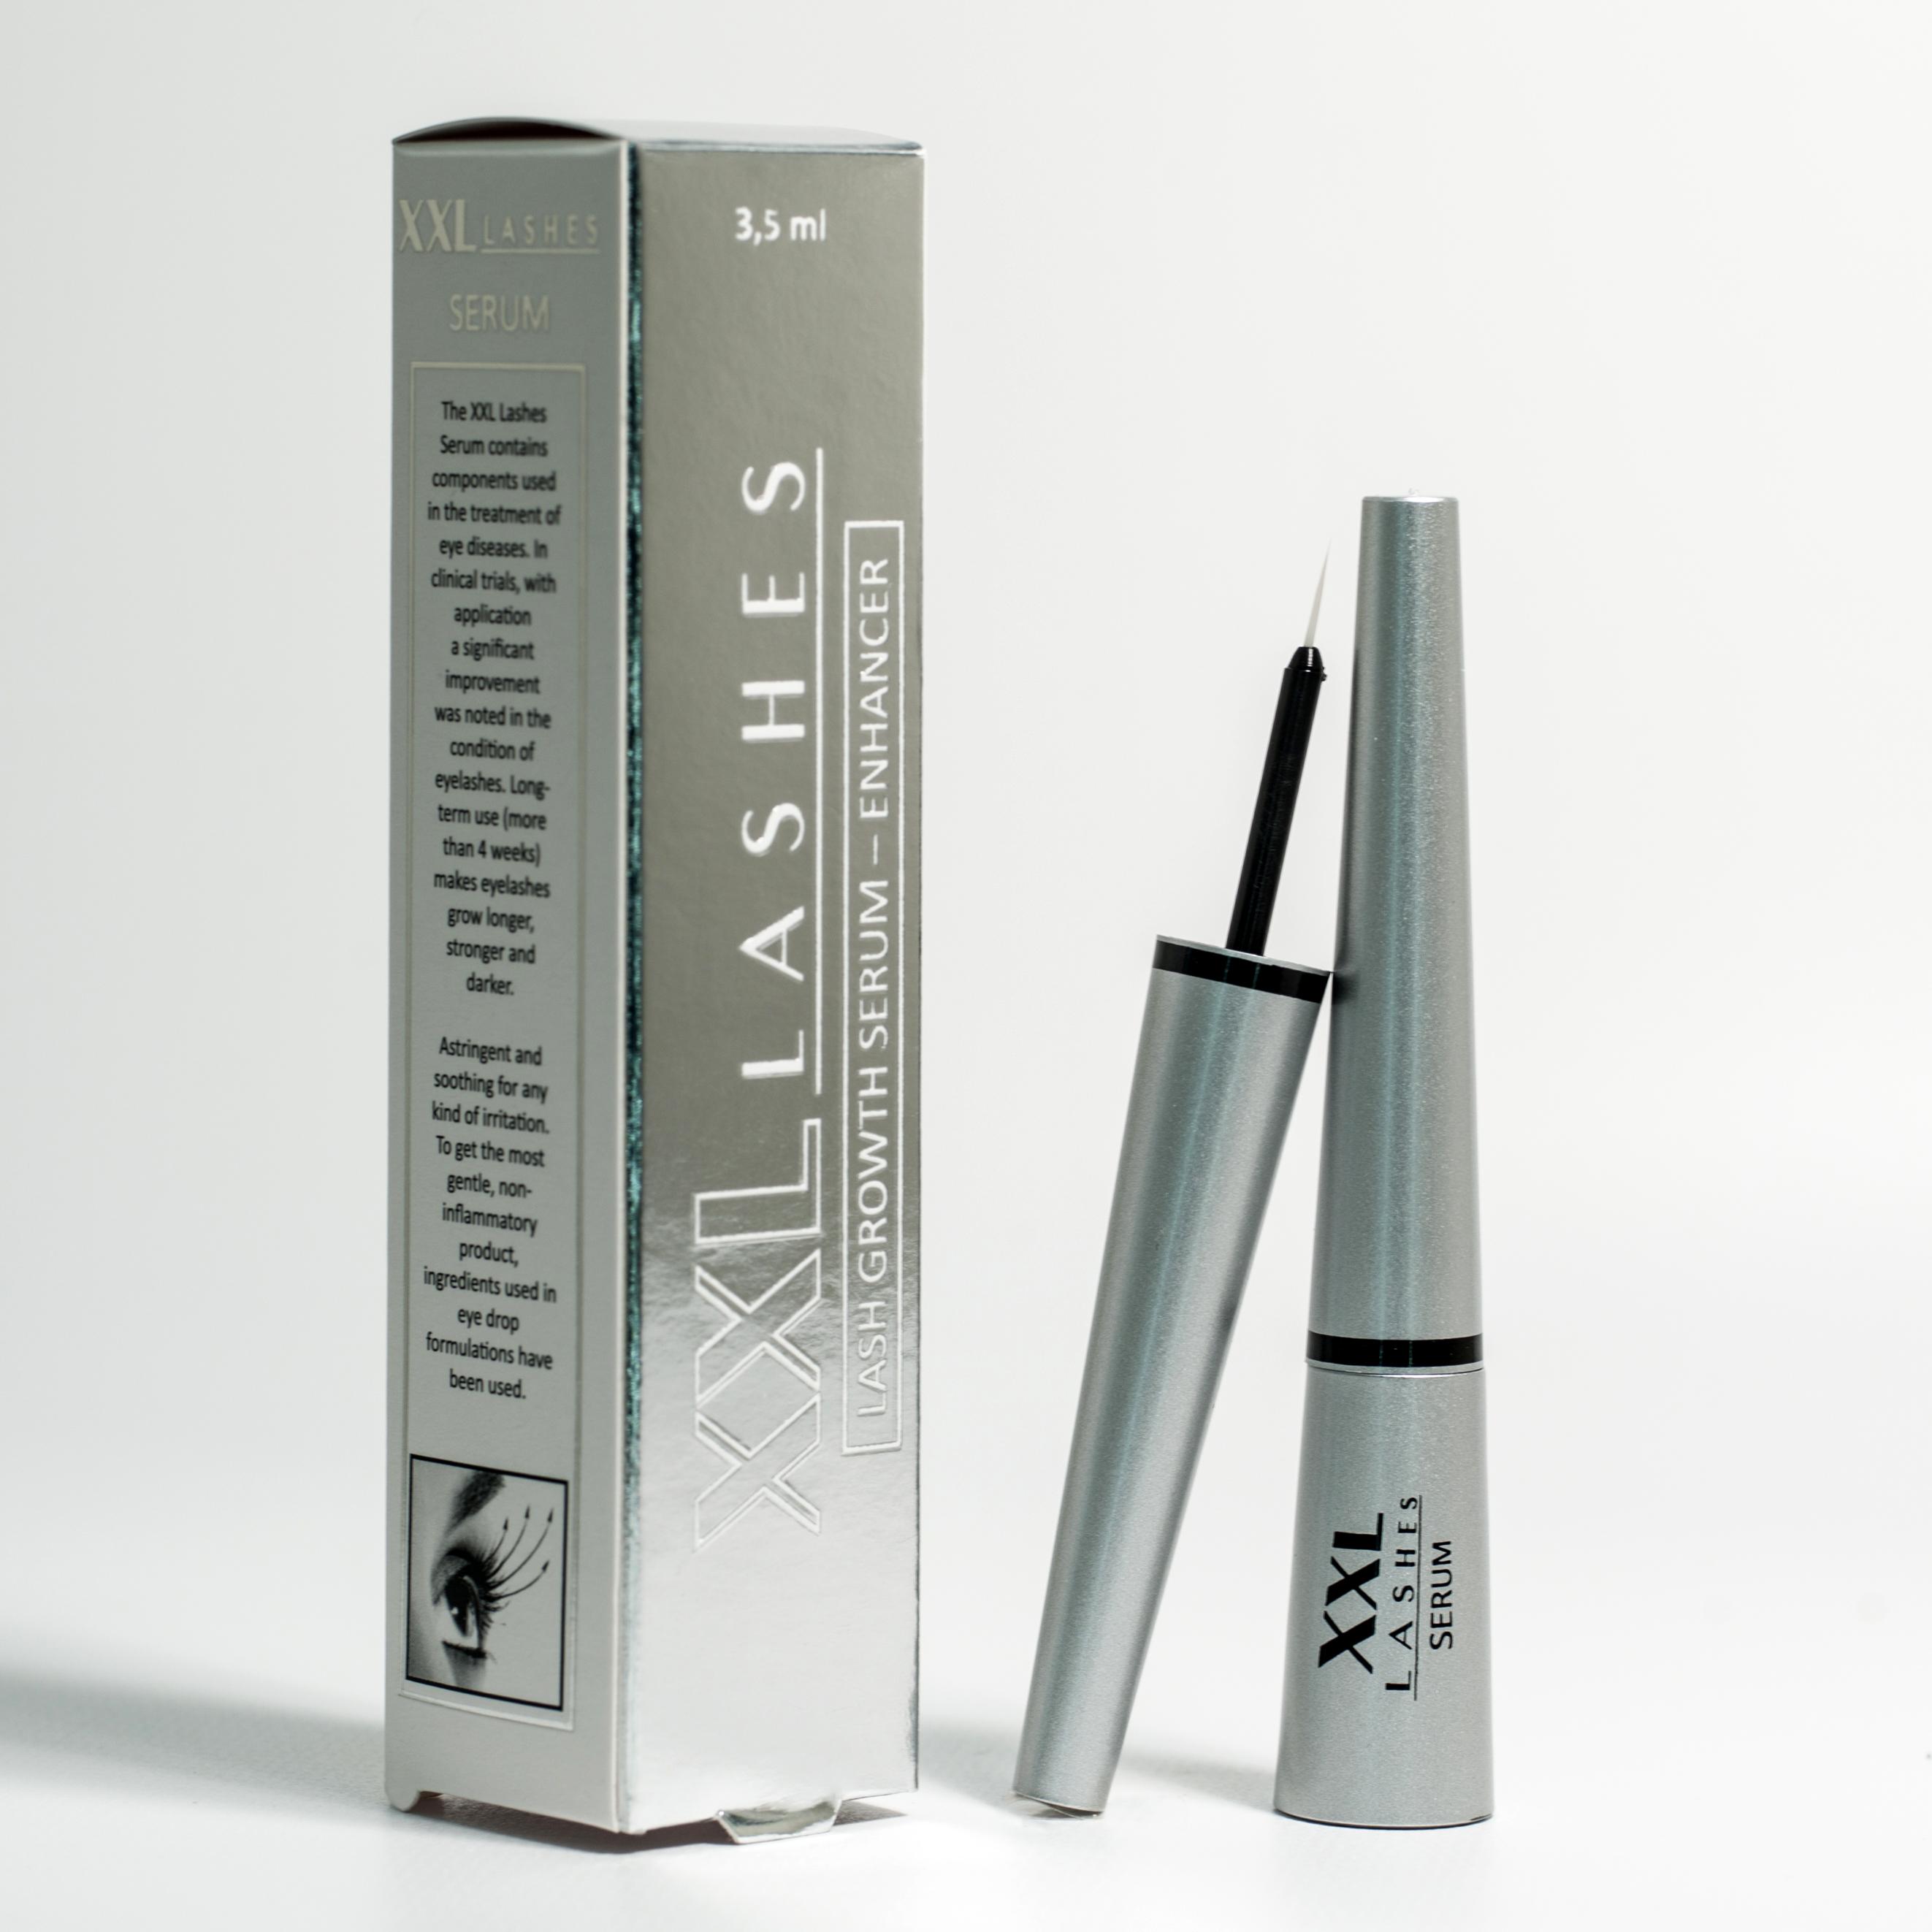 Xxl Lashes Serum For Eyelash Growth